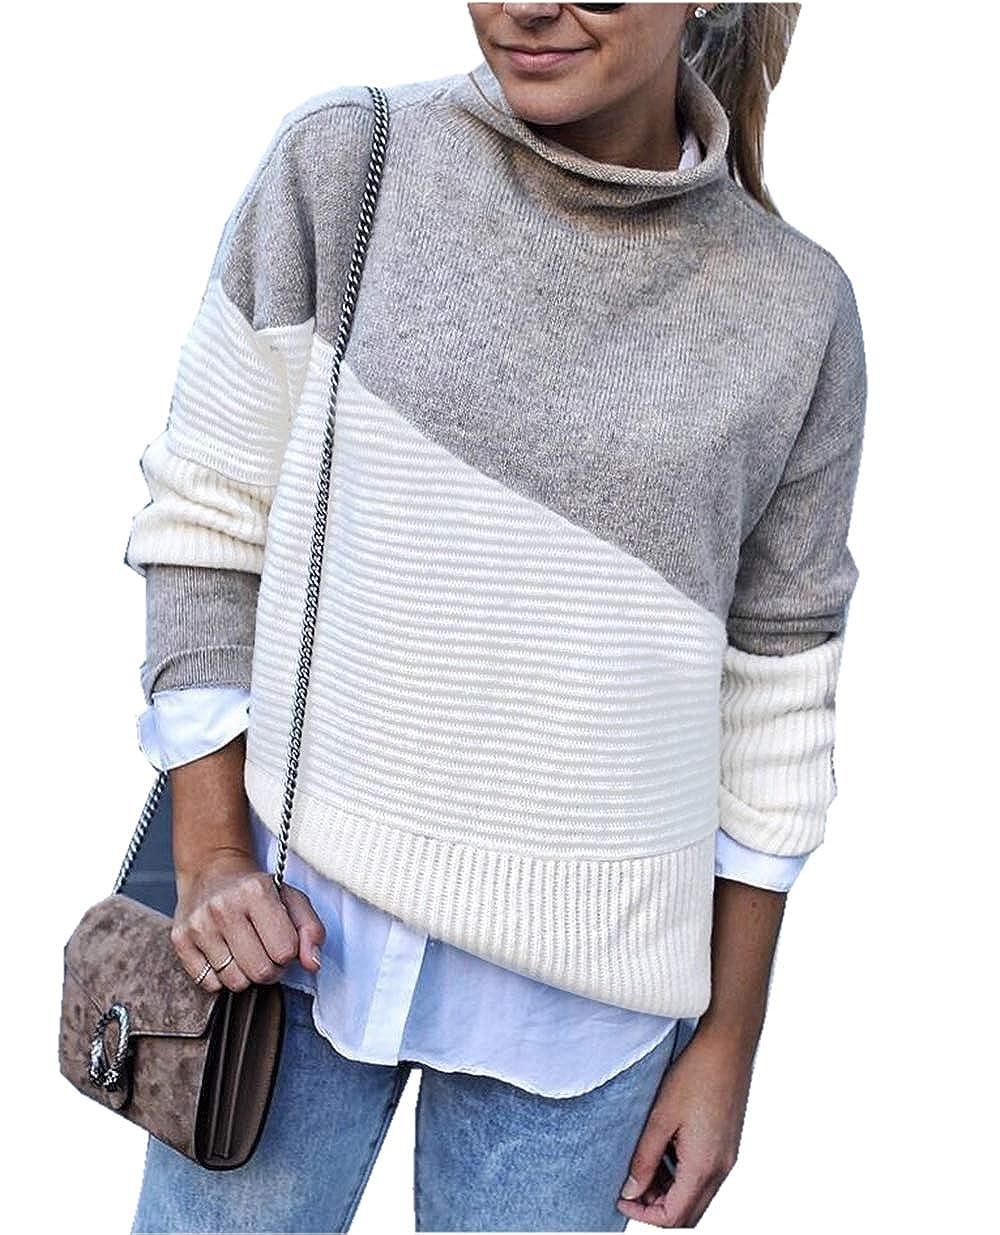 ce09110b959a Asskdan Women s Long Sleeve Turtleneck High Neck Color Block Sweater ...